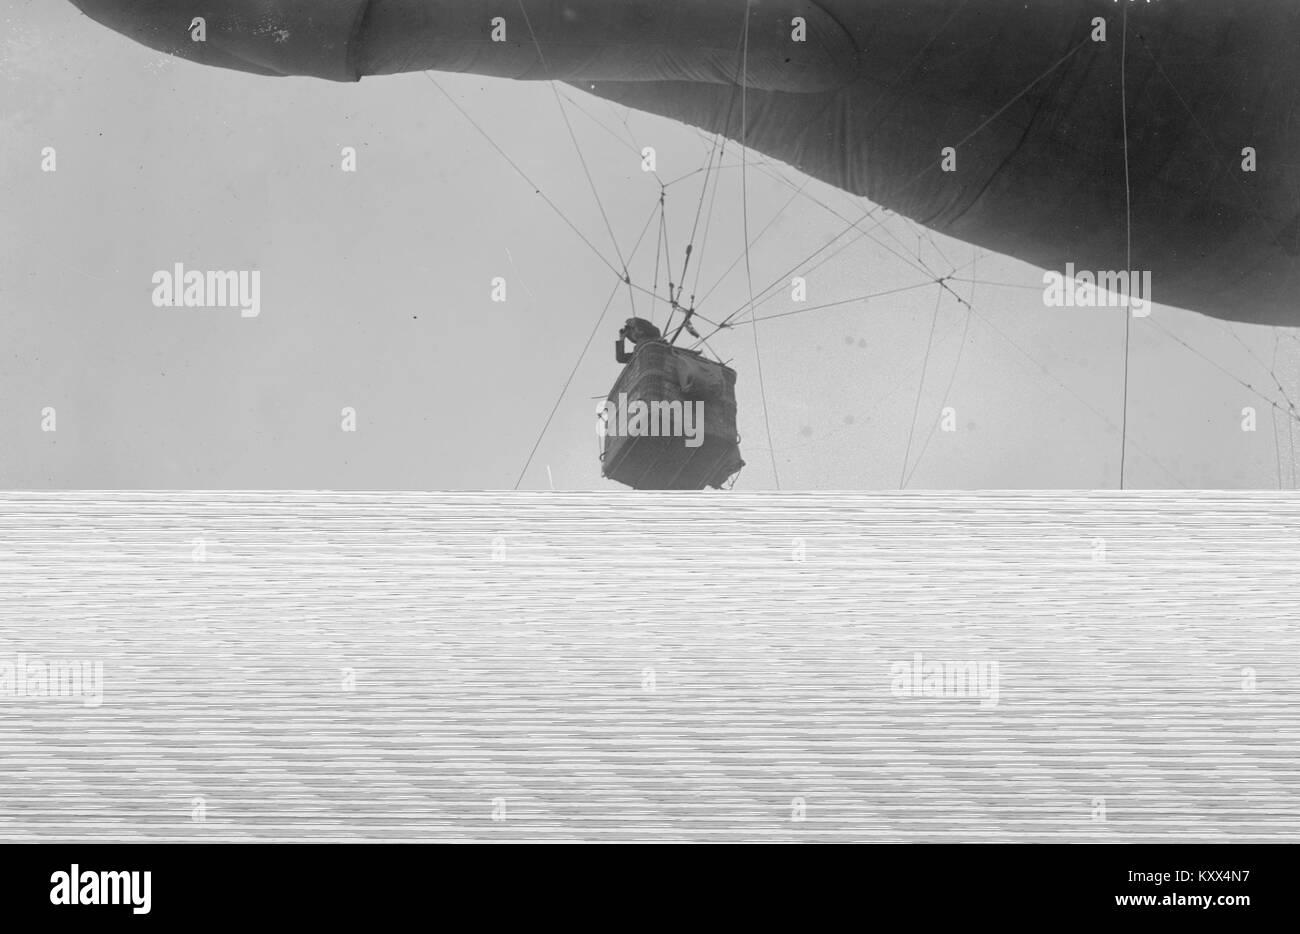 U.S. Army observer in Basket - Stock Image